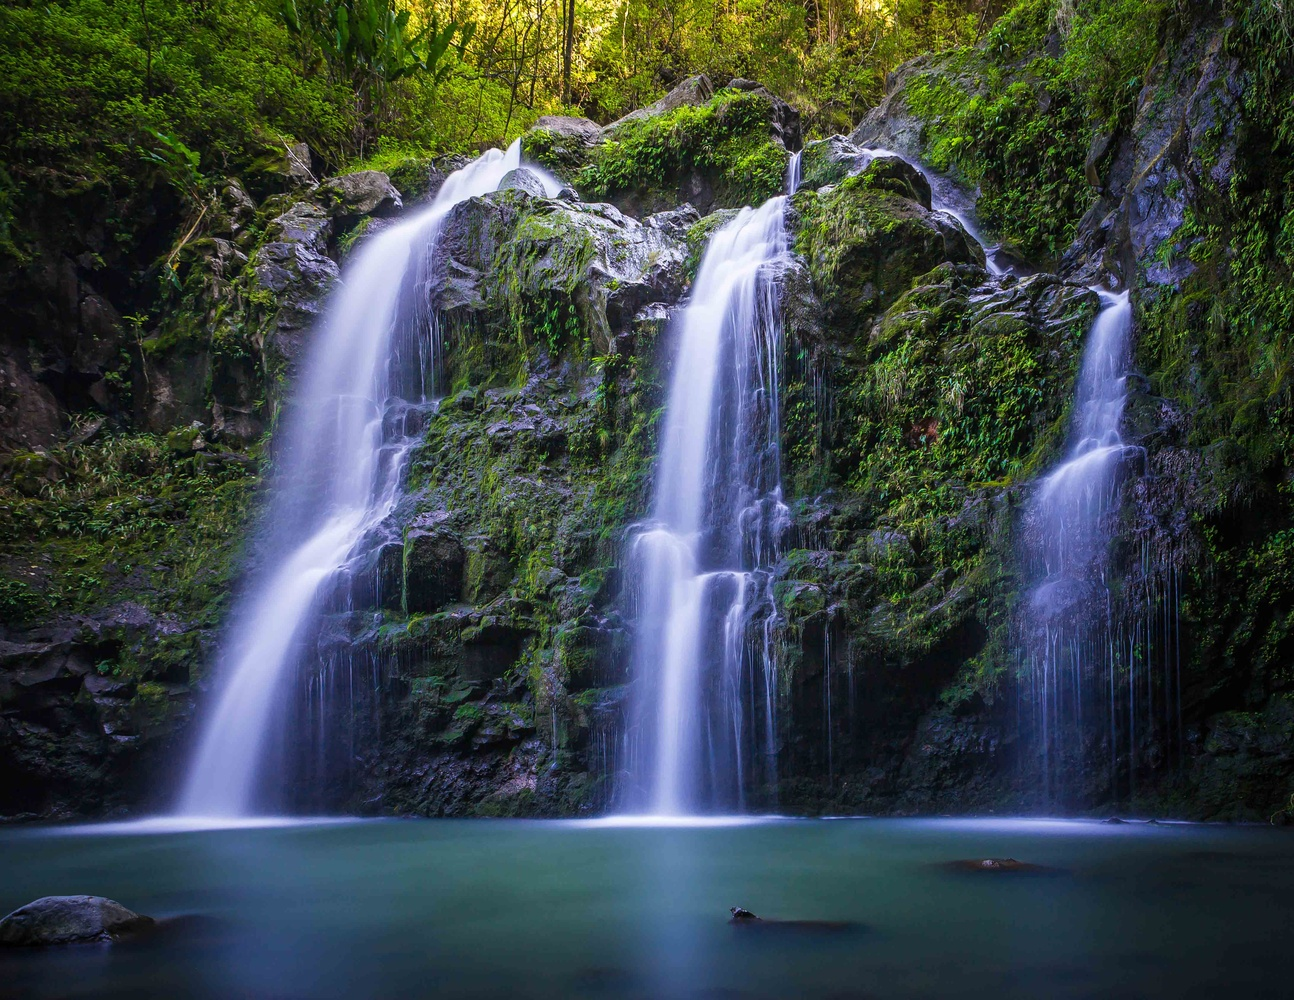 Waioka Falls by Herb Coyle